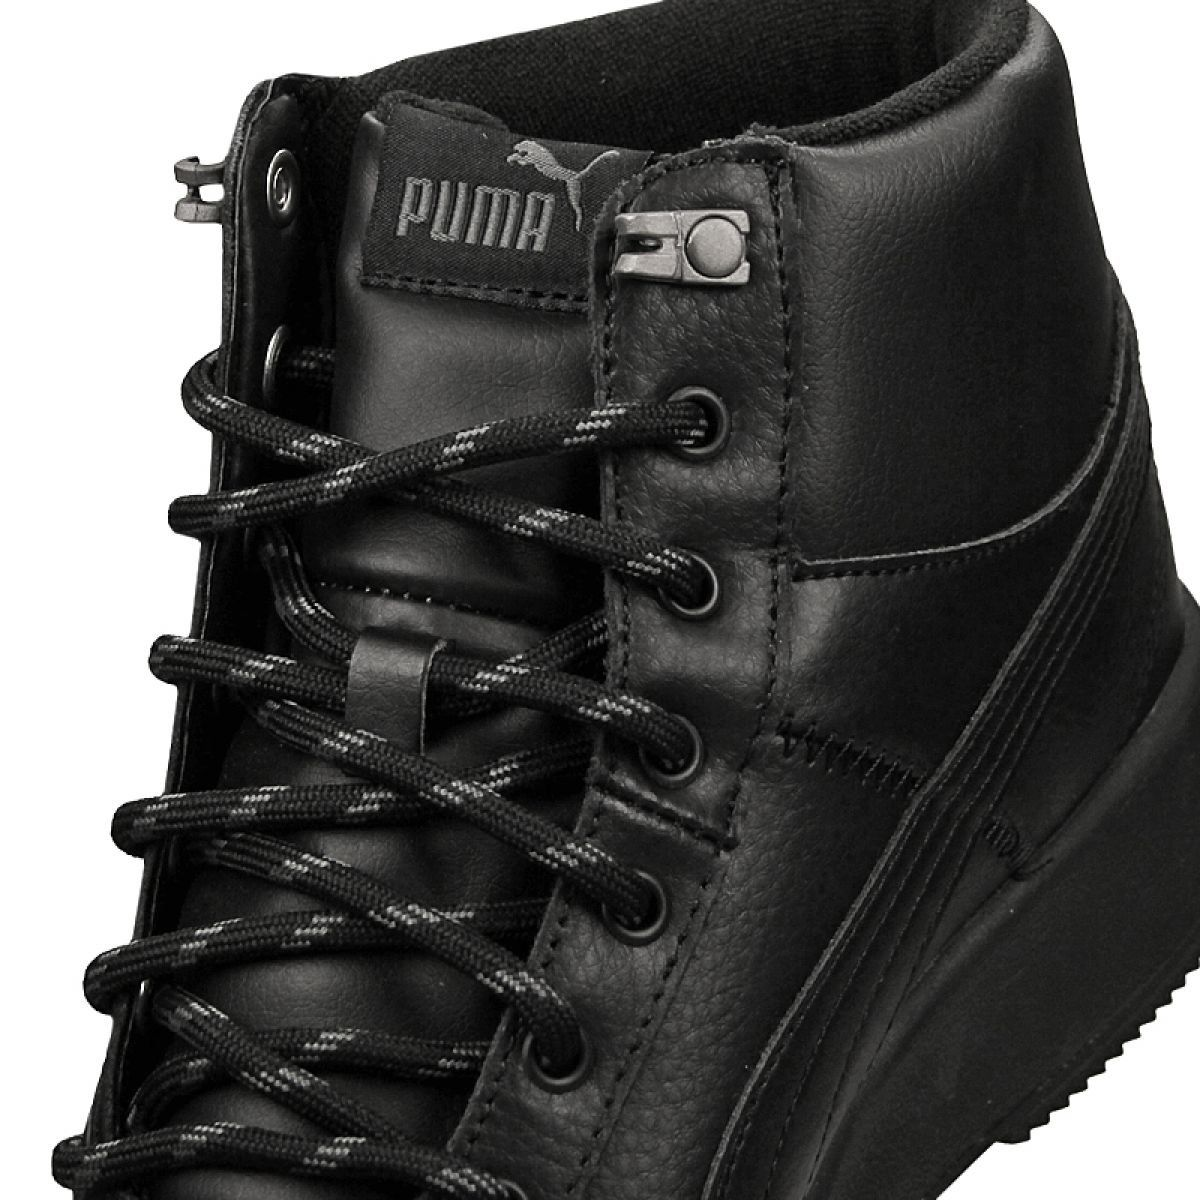 Buty Puma Tarrenz Sb Puretex M 370552 01 Czarne Black Shoes Shoes Sport Shoes Men